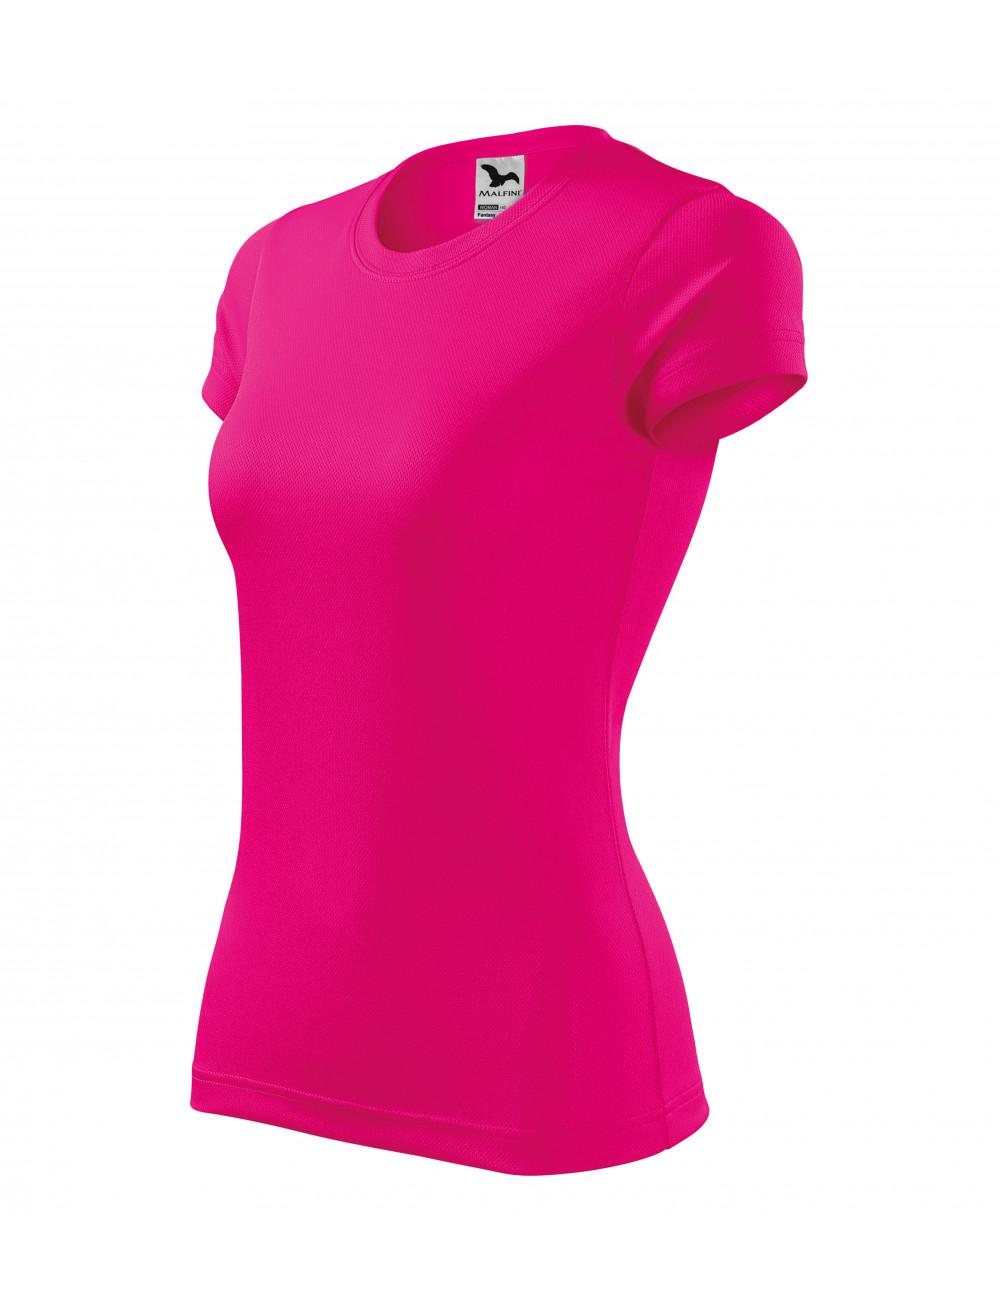 Adler MALFINI Koszulka damska Fantasy 140 neon różowy